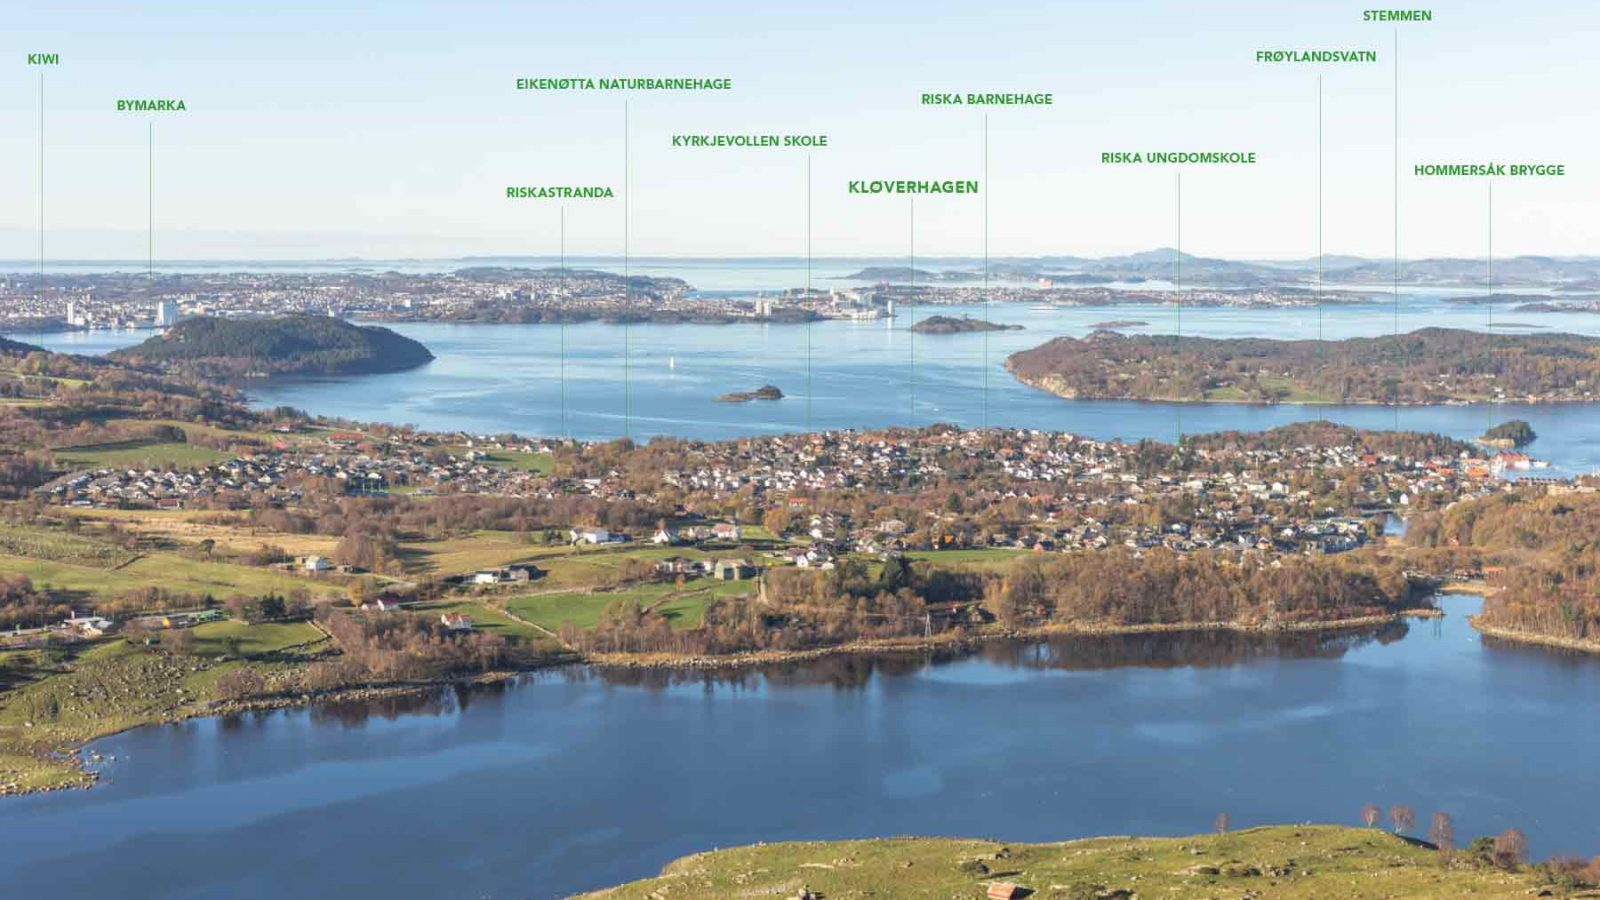 Kløverhagen Hommersåk kart